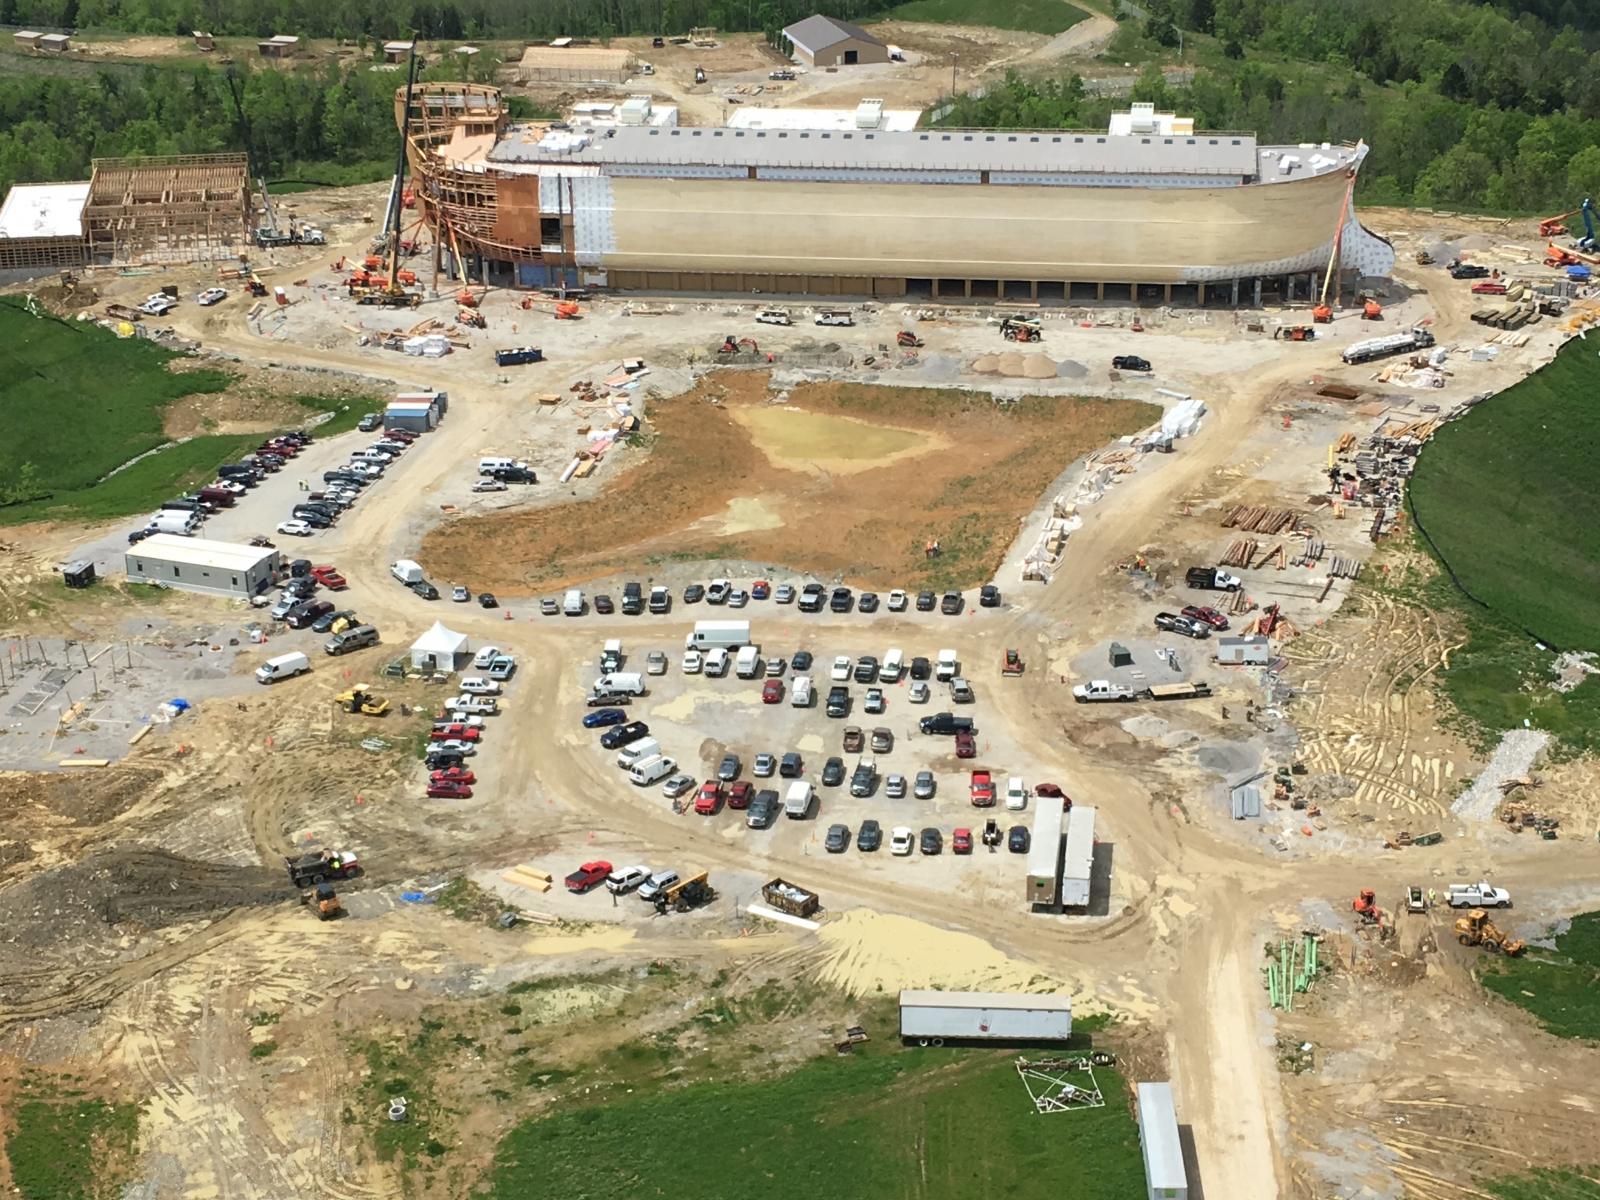 £100m model of Noah's Ark opens for business in Kentucky ...